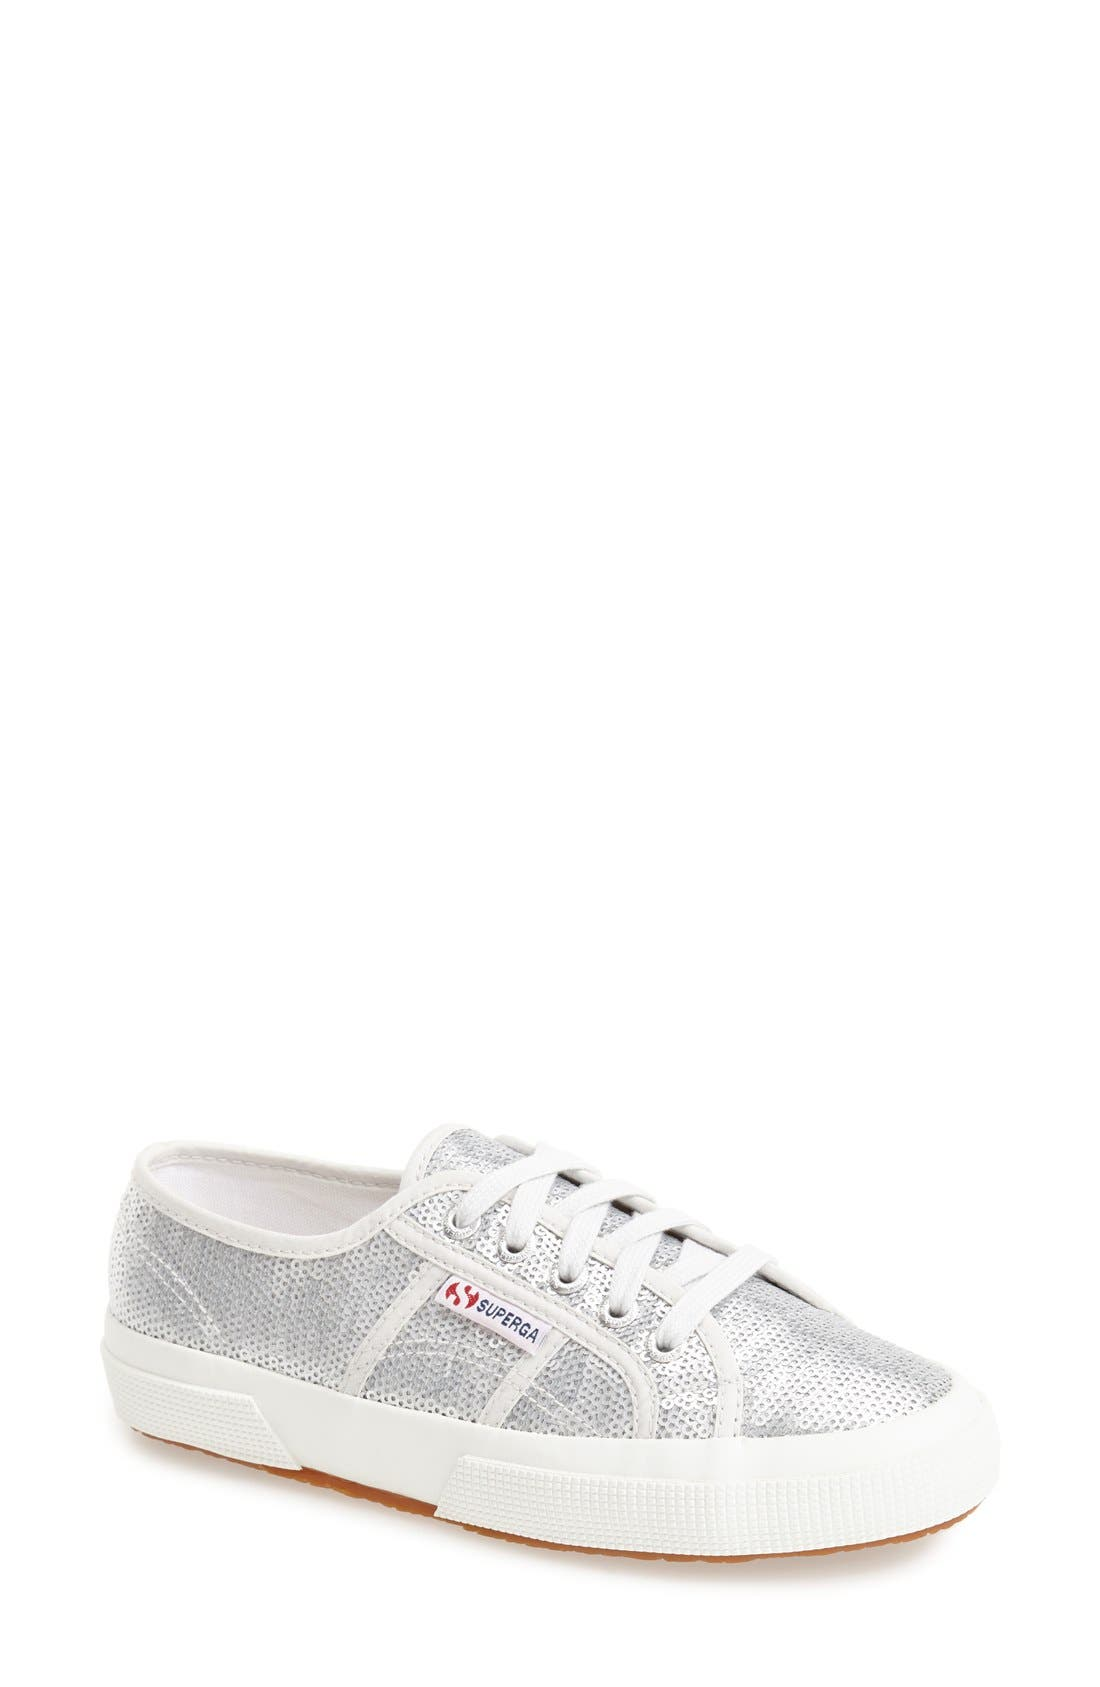 'Metallic' Sneaker,                             Main thumbnail 1, color,                             040